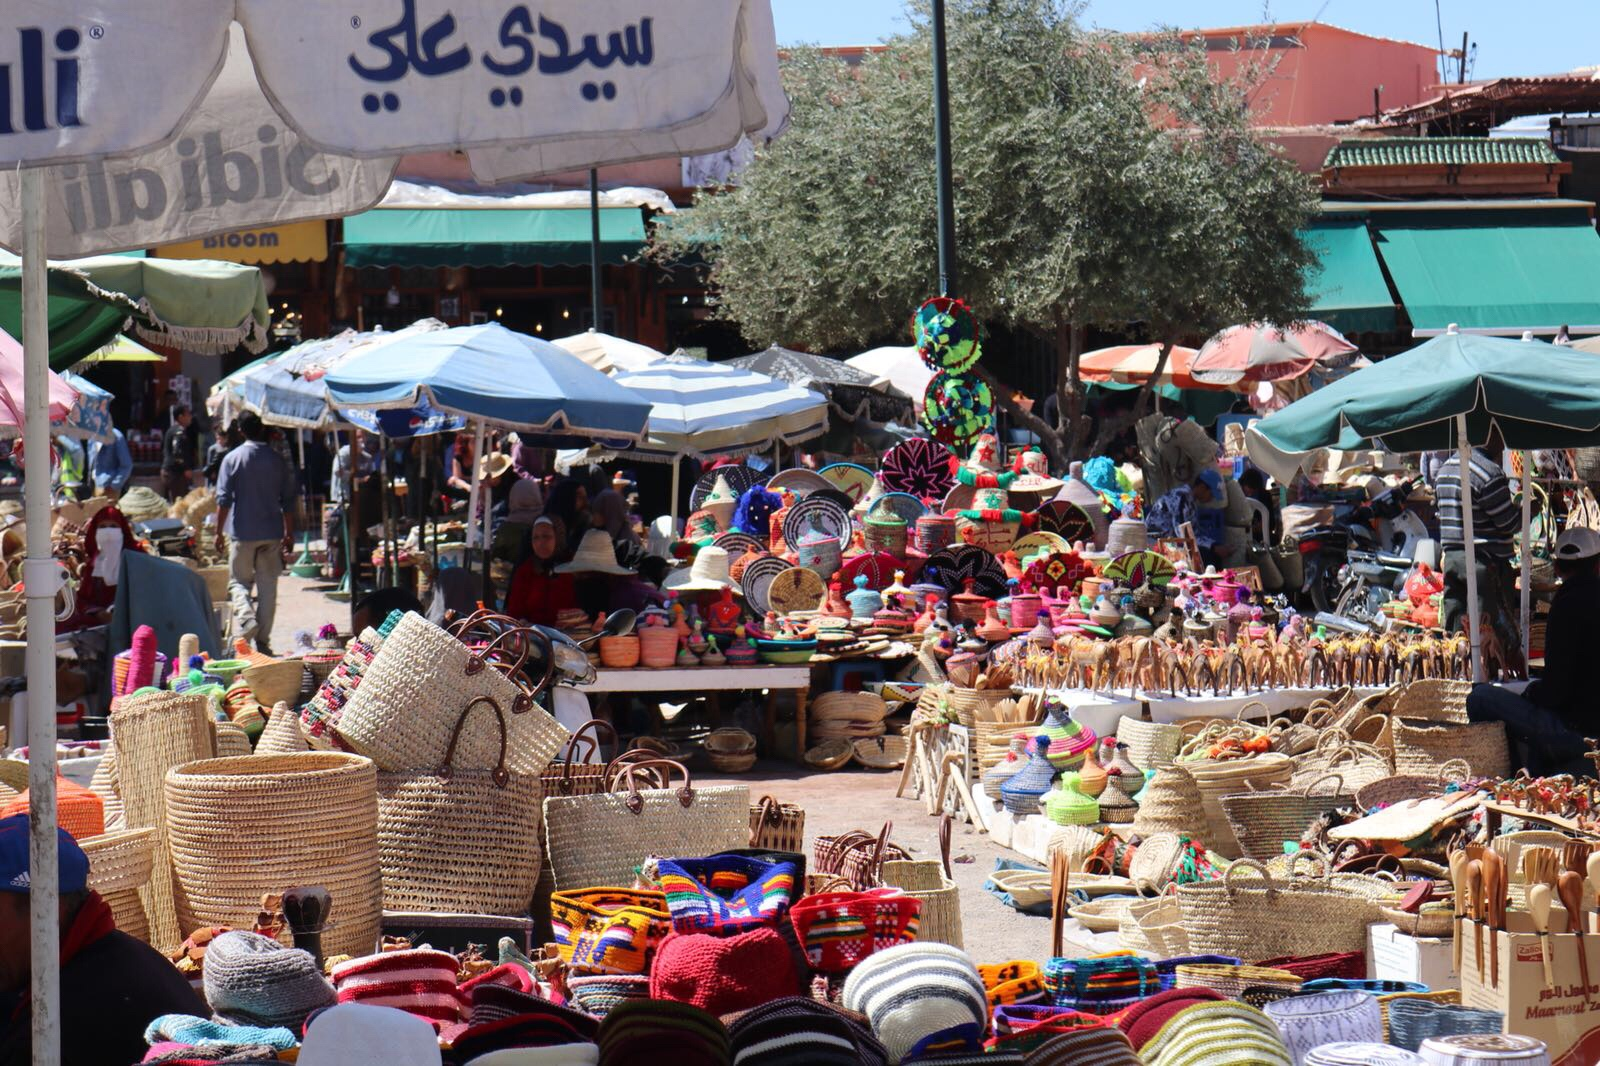 kul i soukerna i marrakech